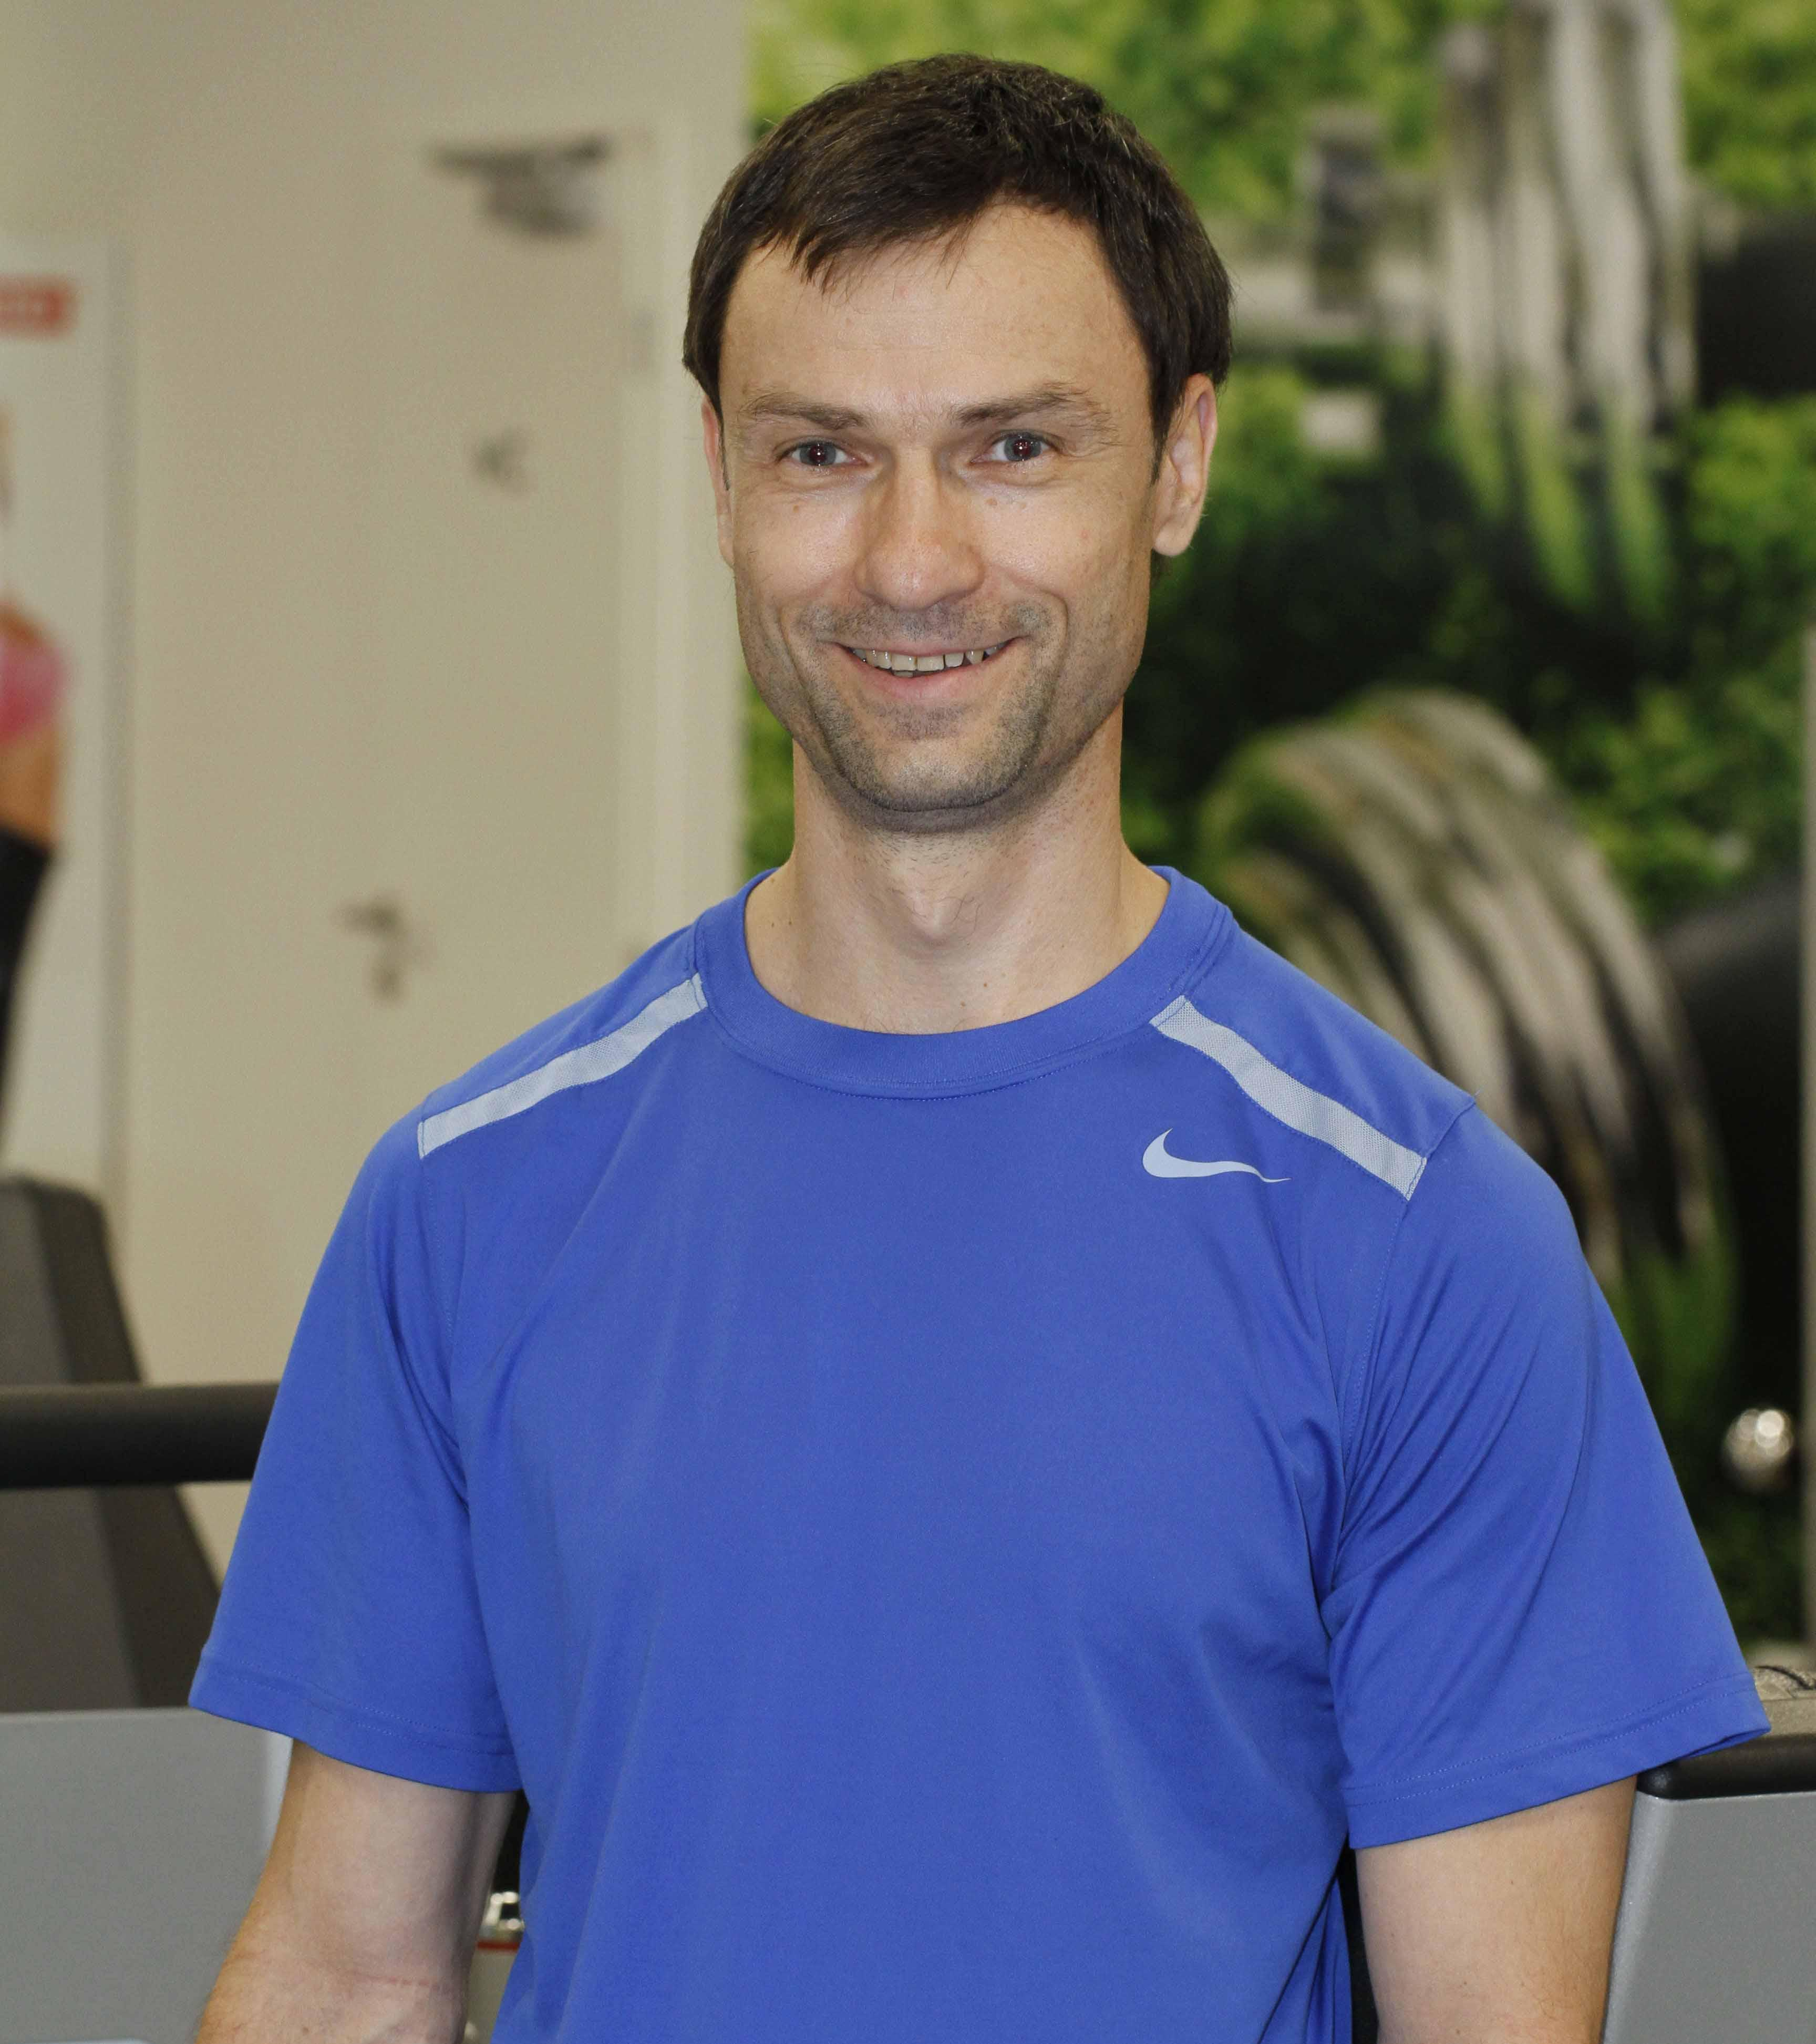 Vladimmir Ondra